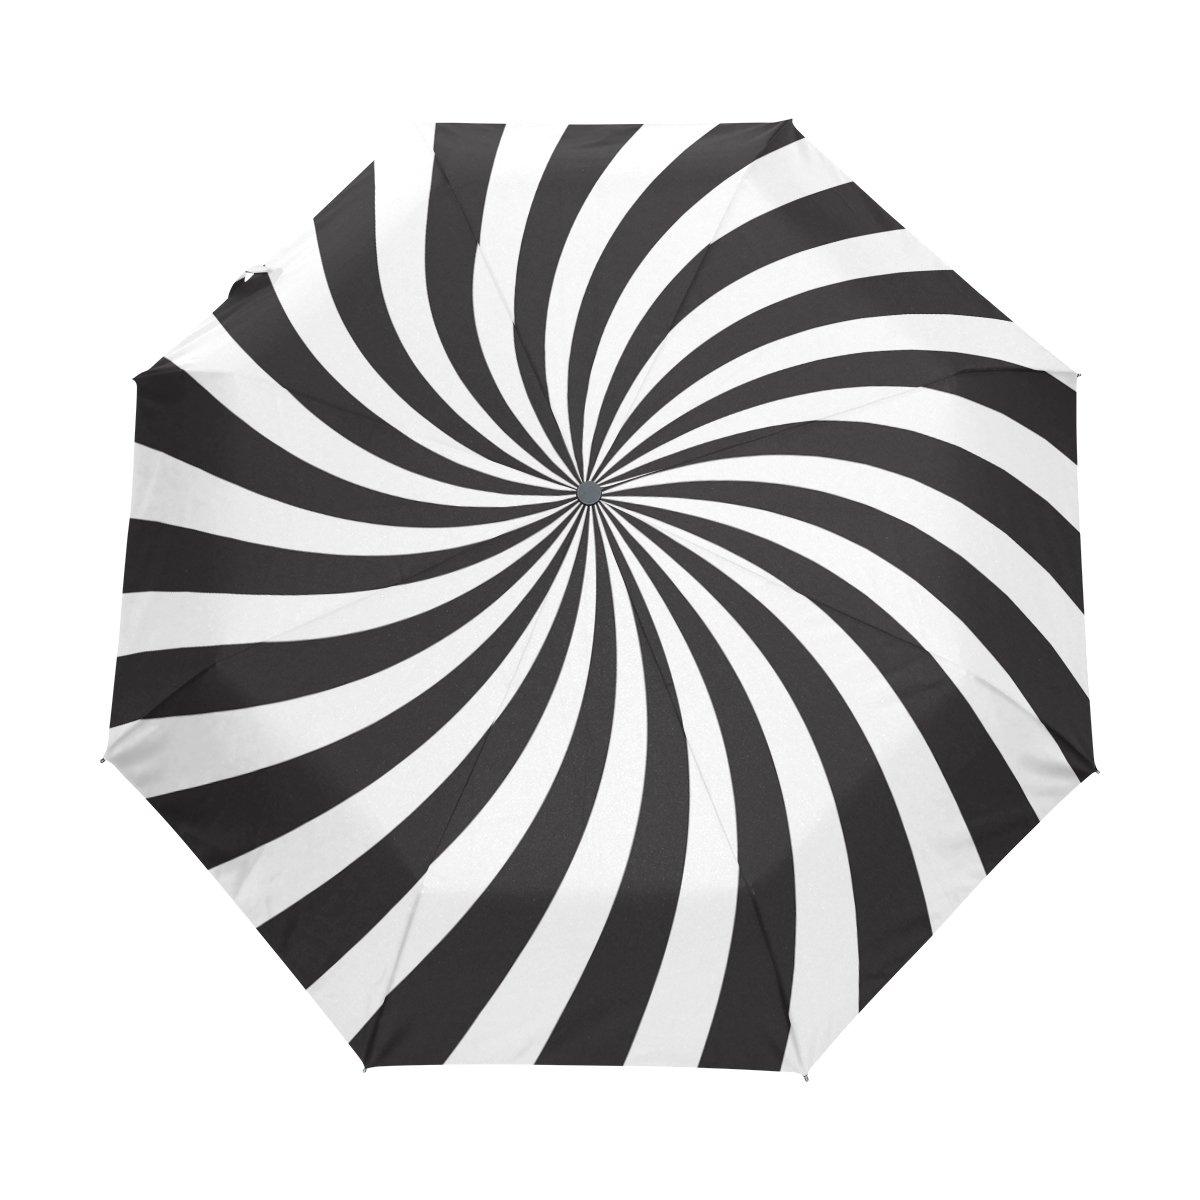 Naanle Black White Spiral Swirl Auto Open Close Foldable Windproof Travel Umbrella B077QGTLGJ